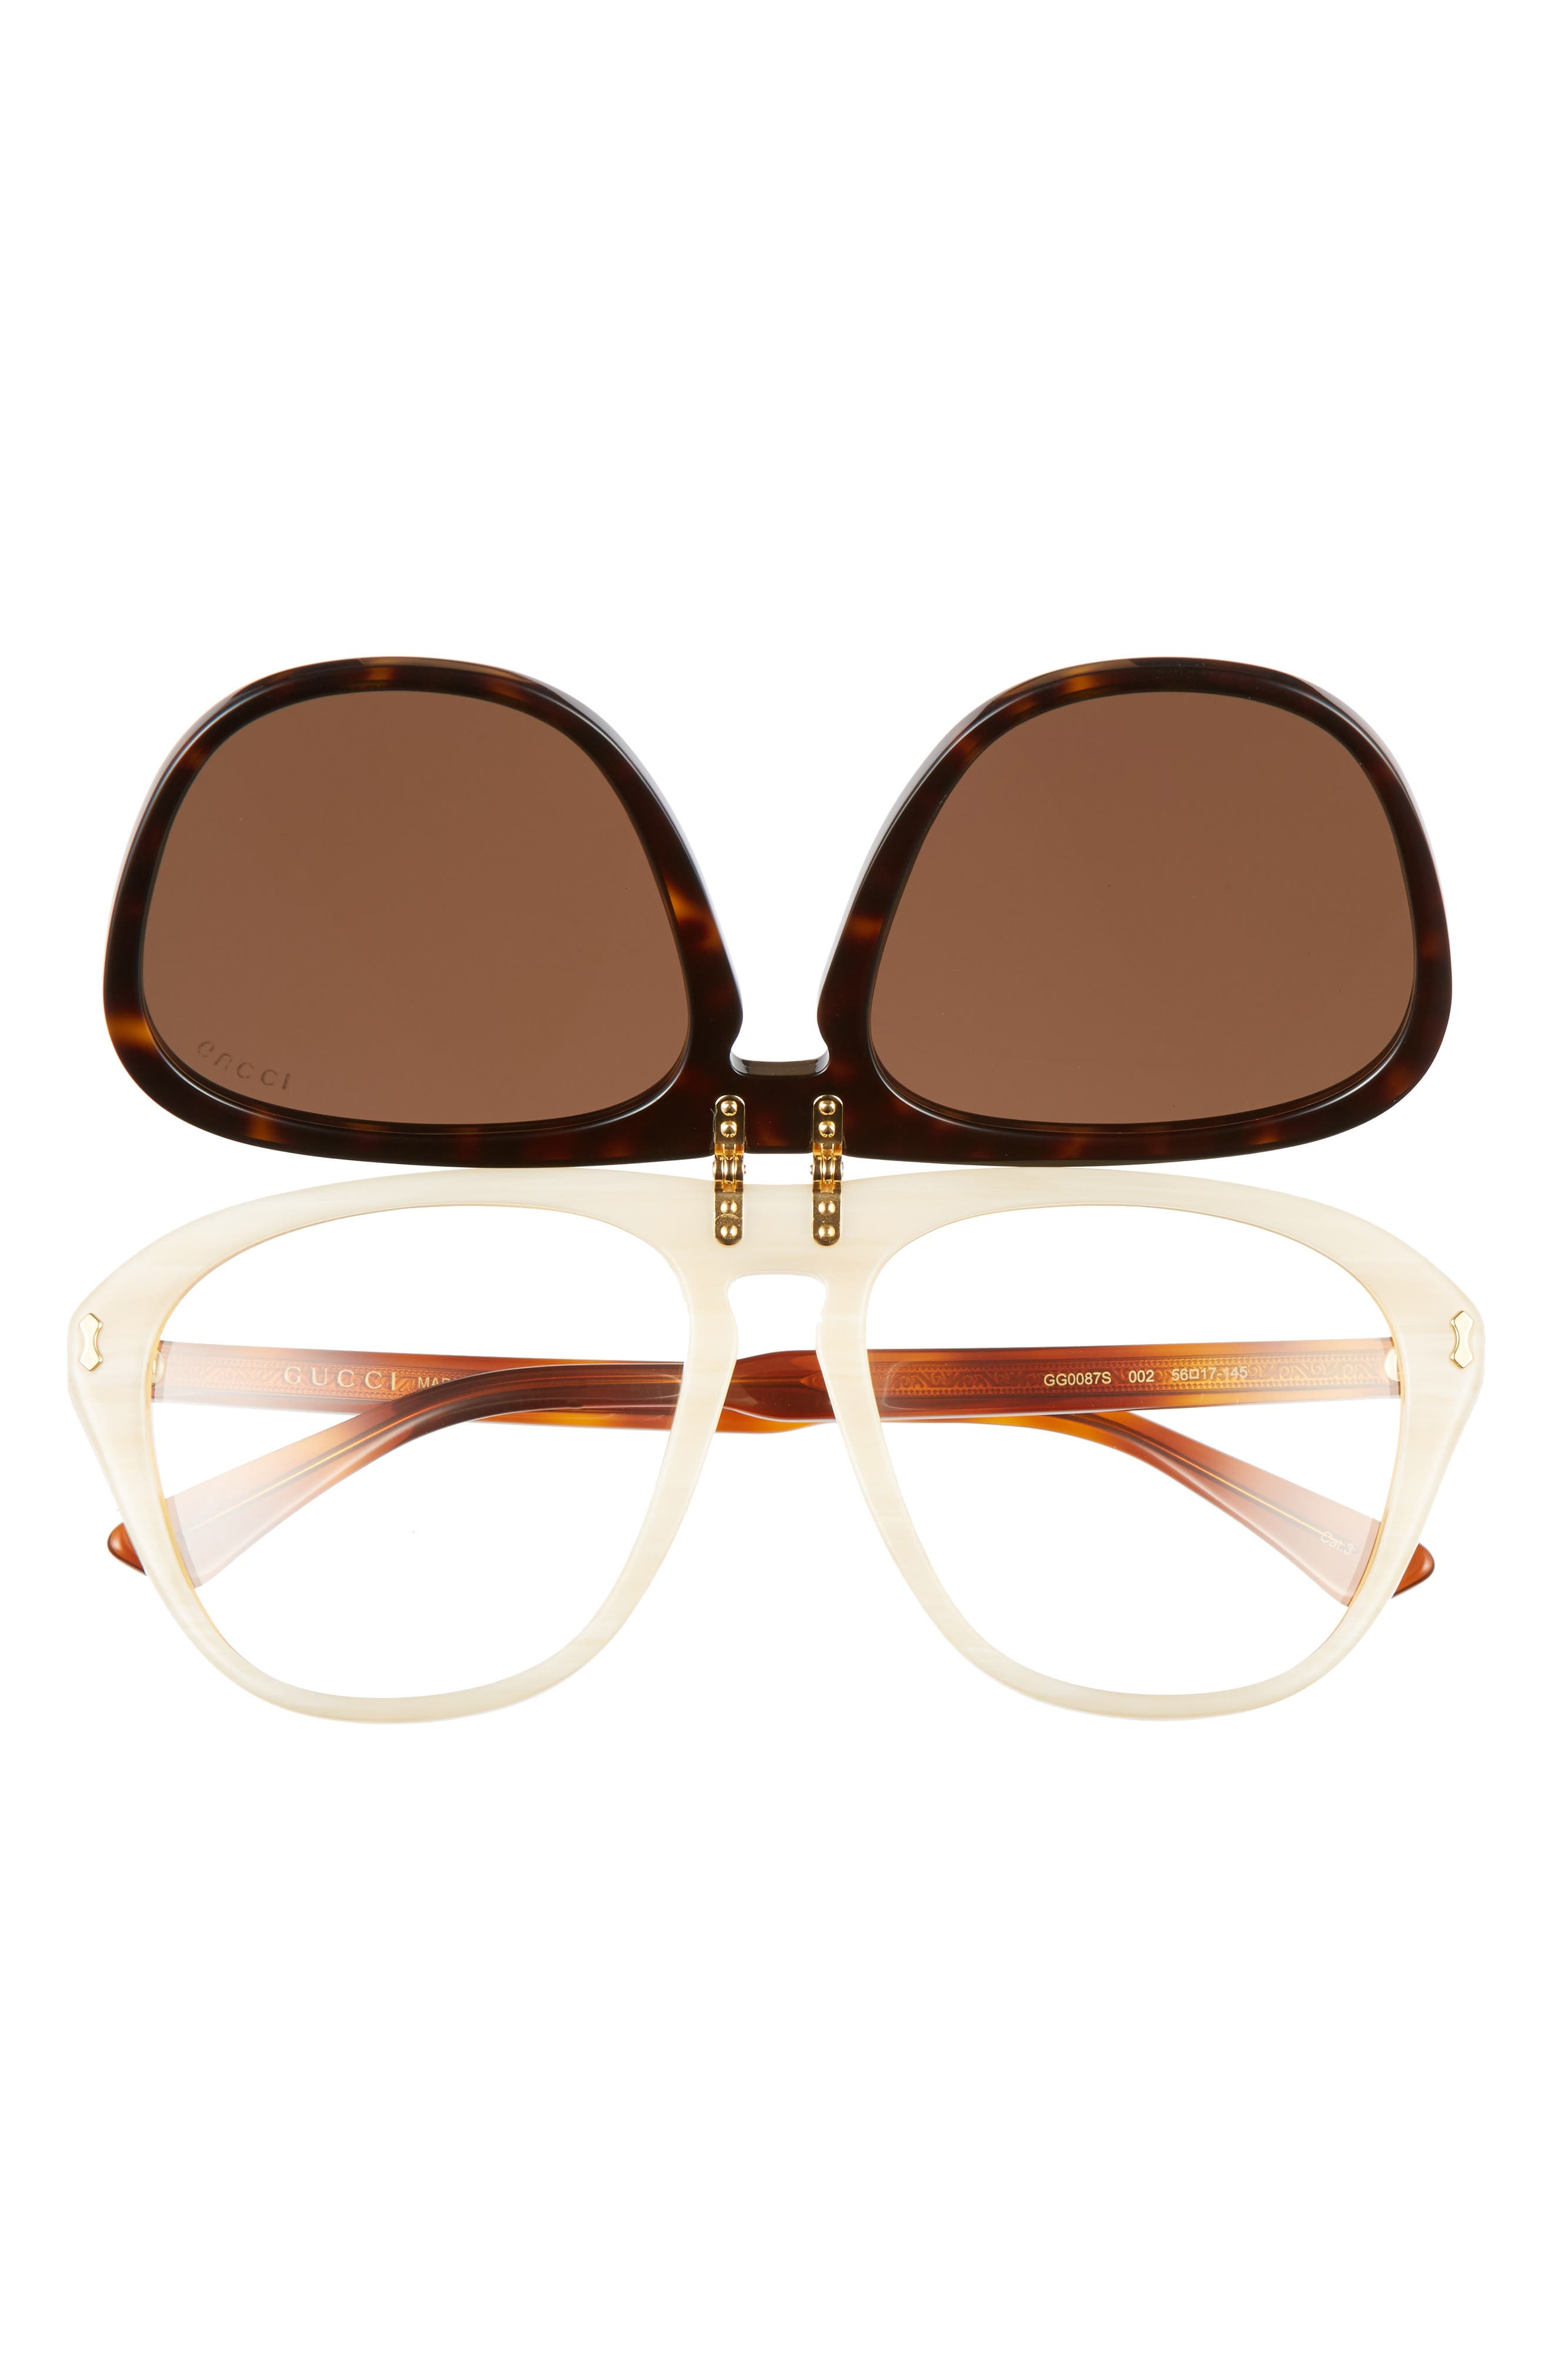 56mm Flip-Up Sunglasses,                             Alternate thumbnail 3, color,                             HAVANA/ BROWN